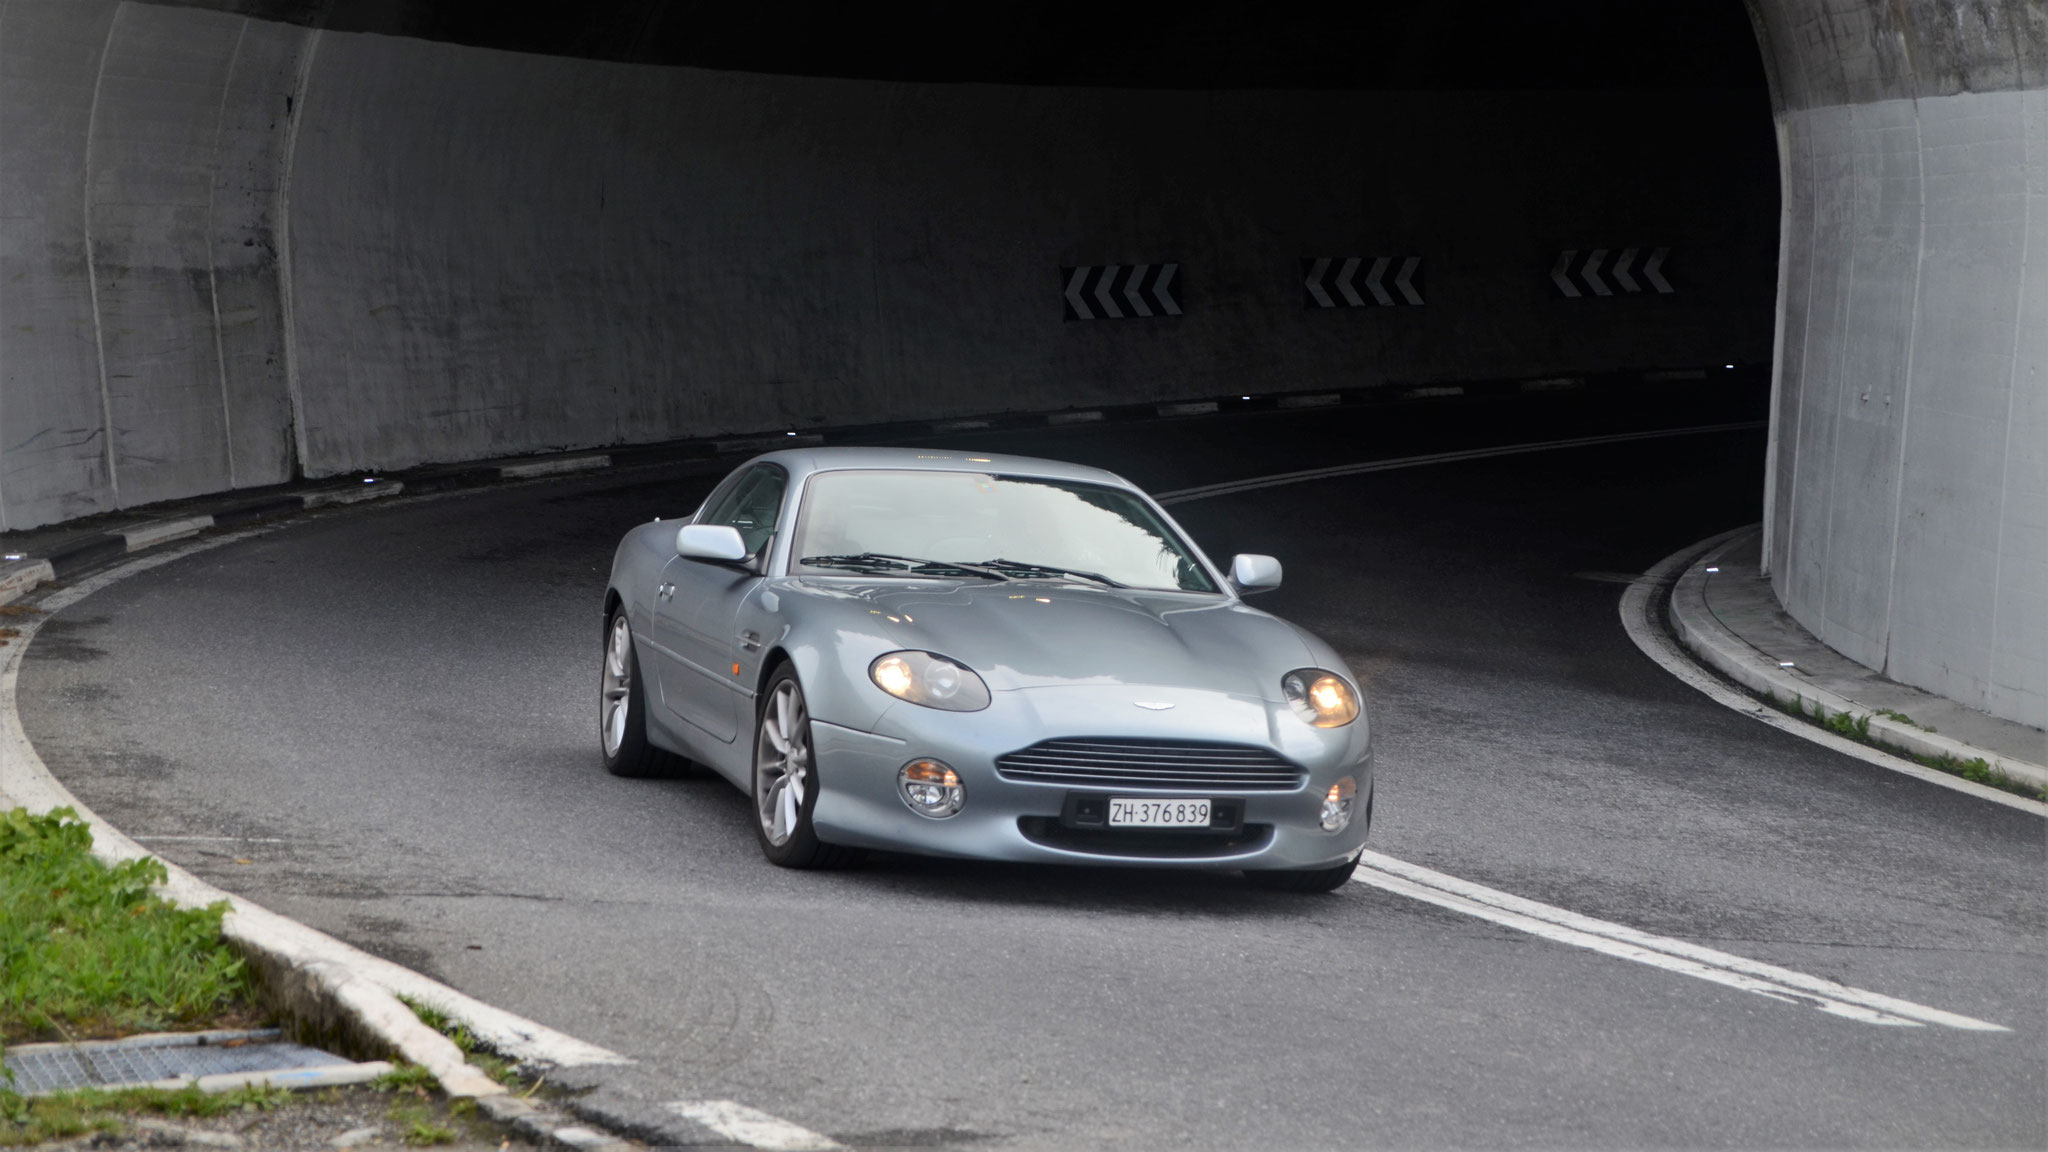 Aston Martin DB7 - ZH-376839 (CH)